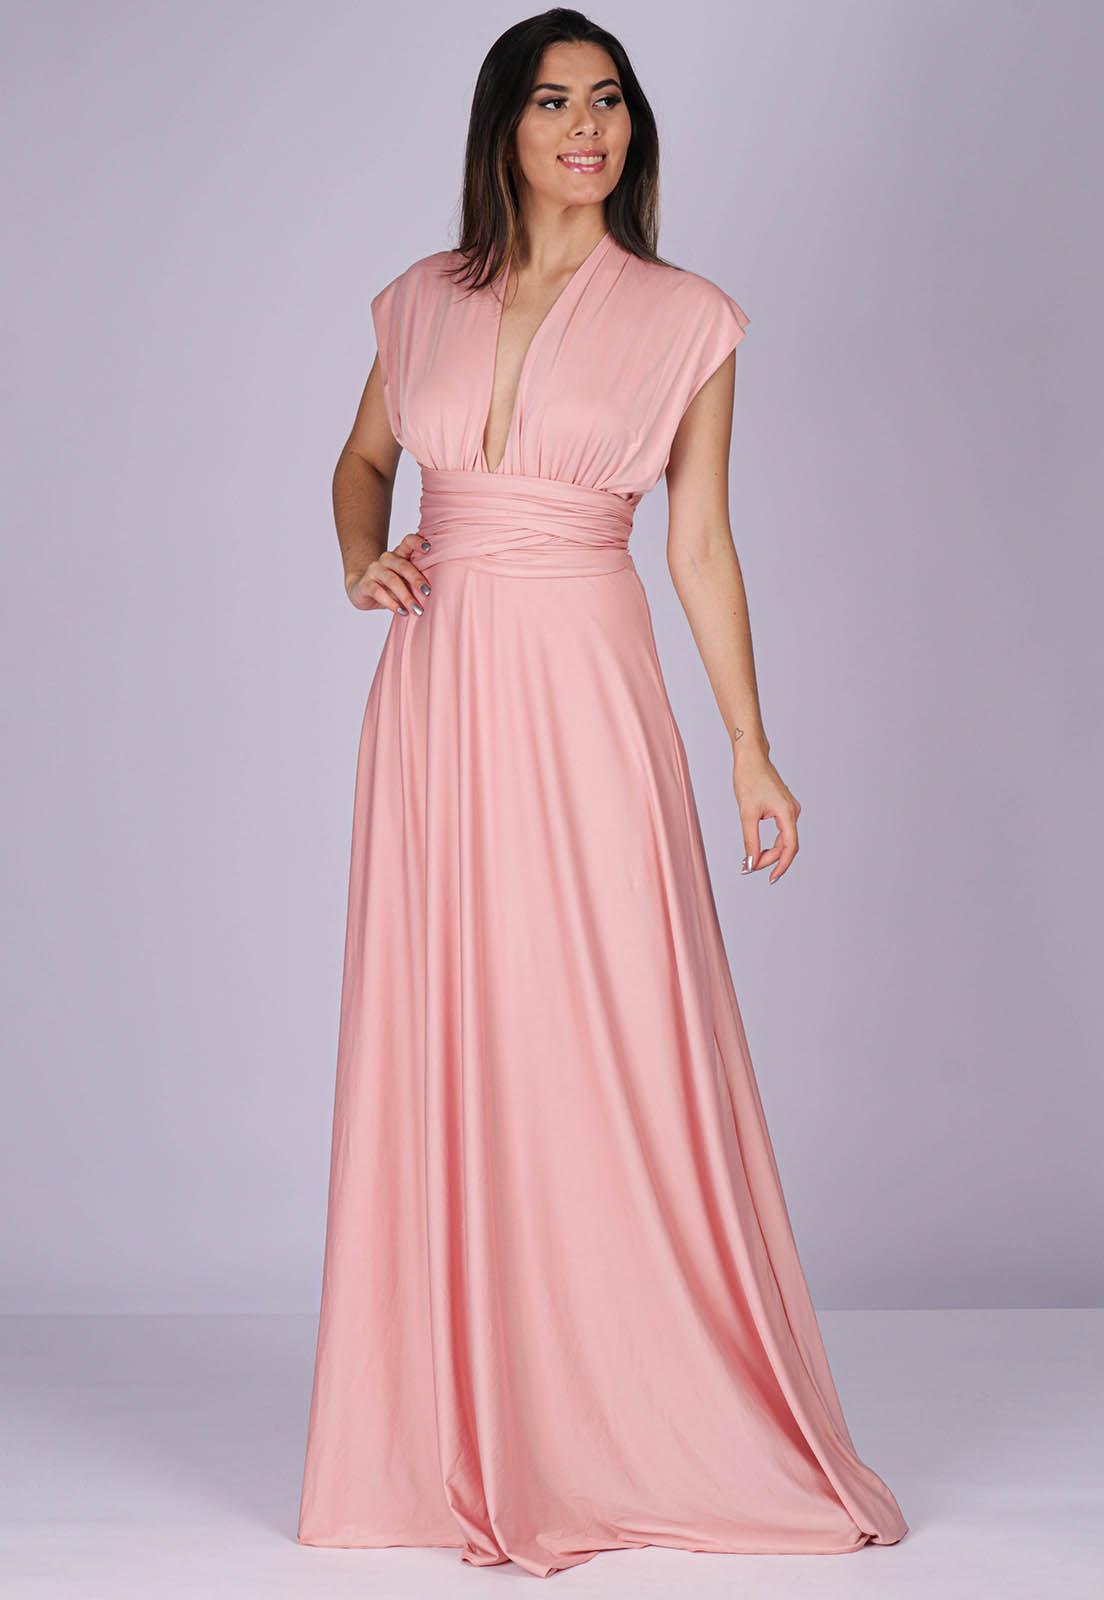 Vestido Longo de Festa Grécia Versatil Rose